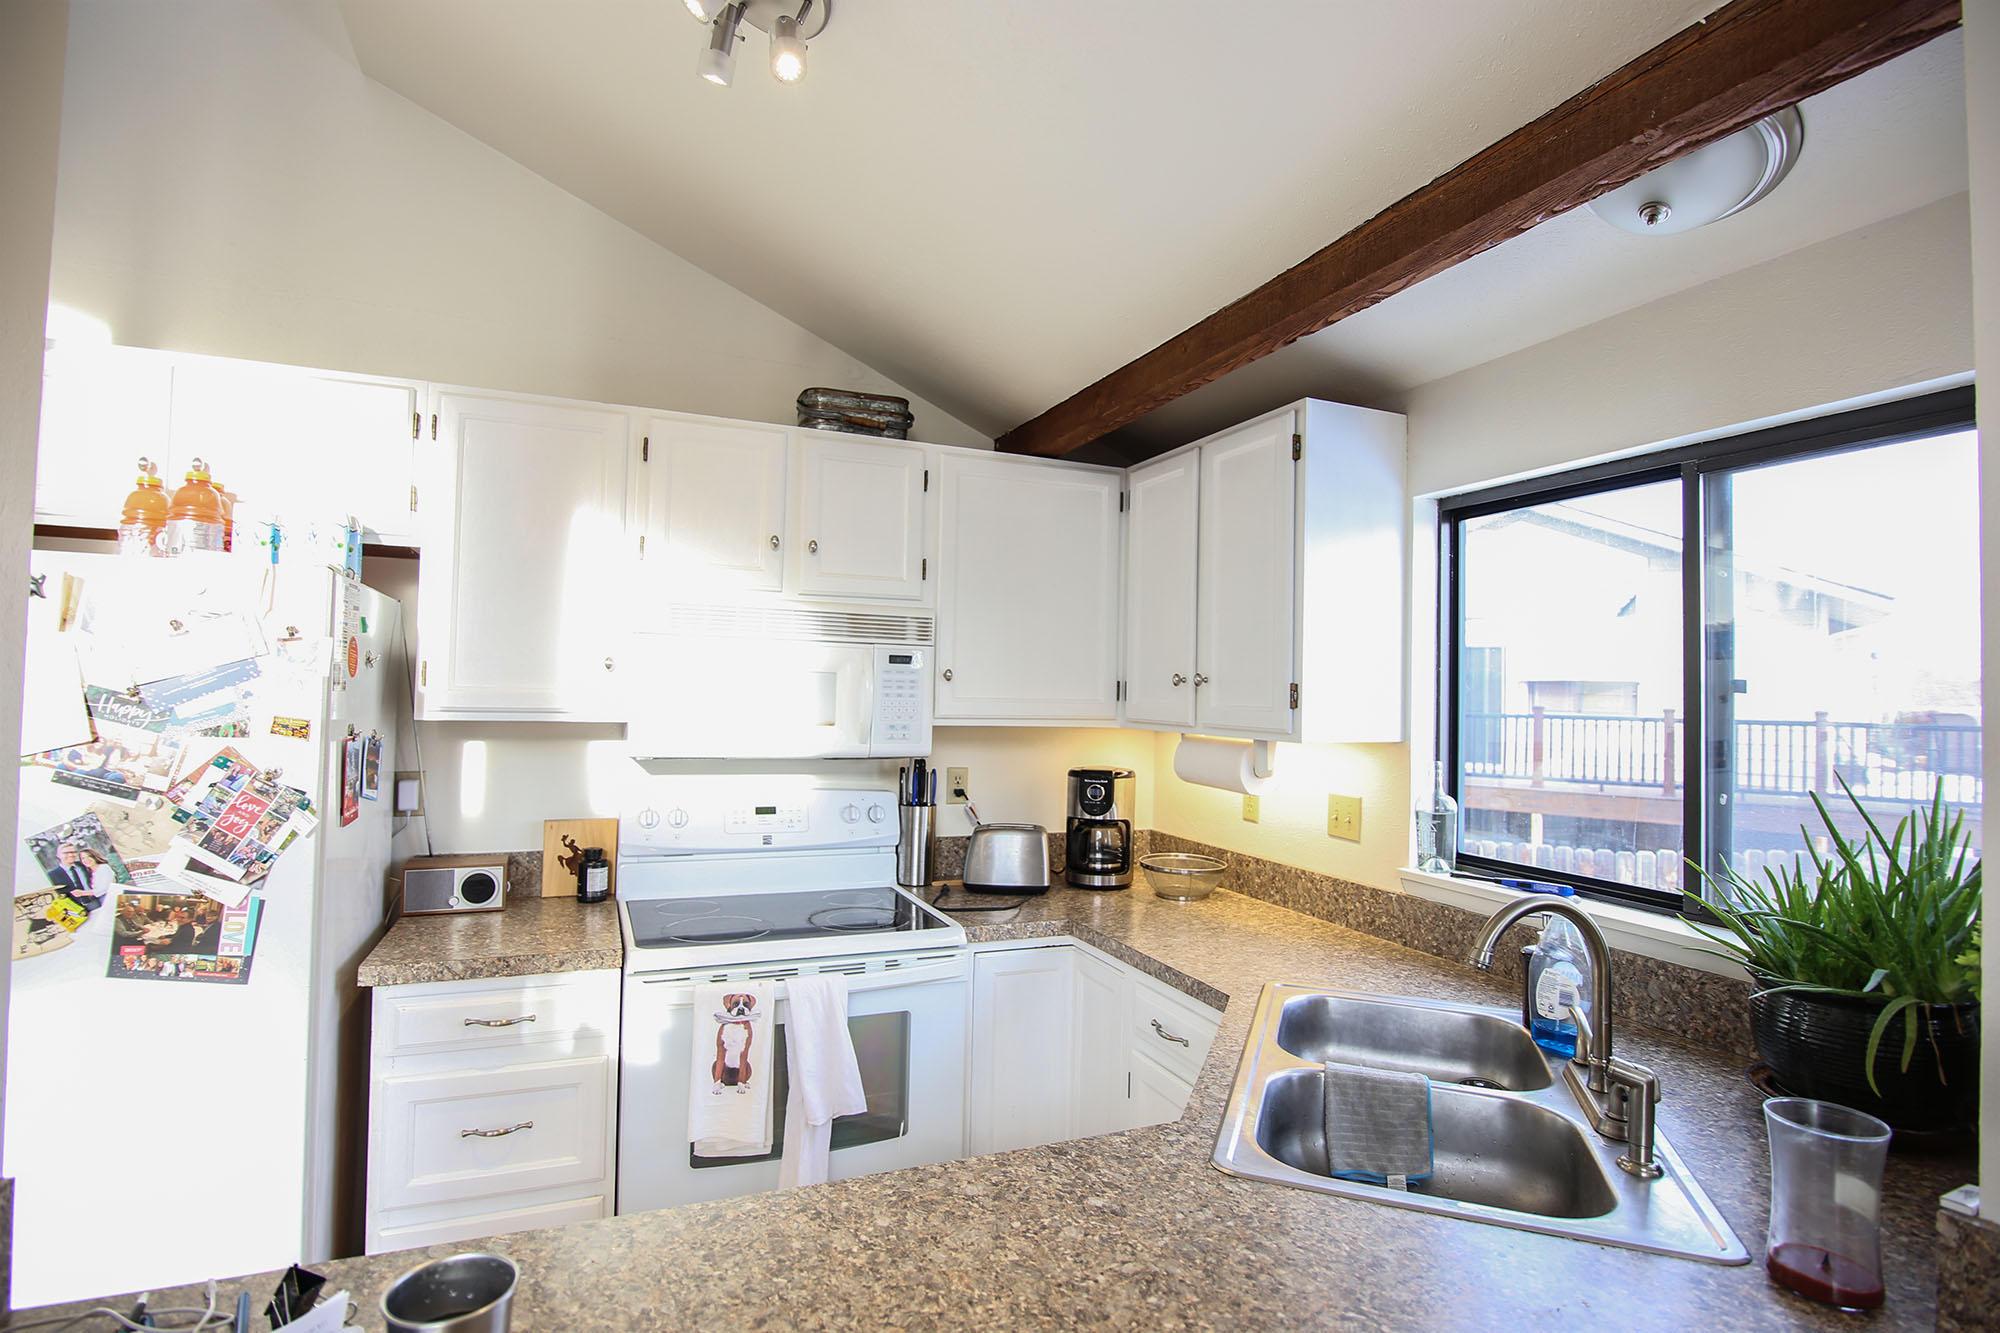 331 Pheasant Place, Sheridan, Wyoming 82801, 3 Bedrooms Bedrooms, ,2 BathroomsBathrooms,Residential,For Sale,Pheasant,19-43